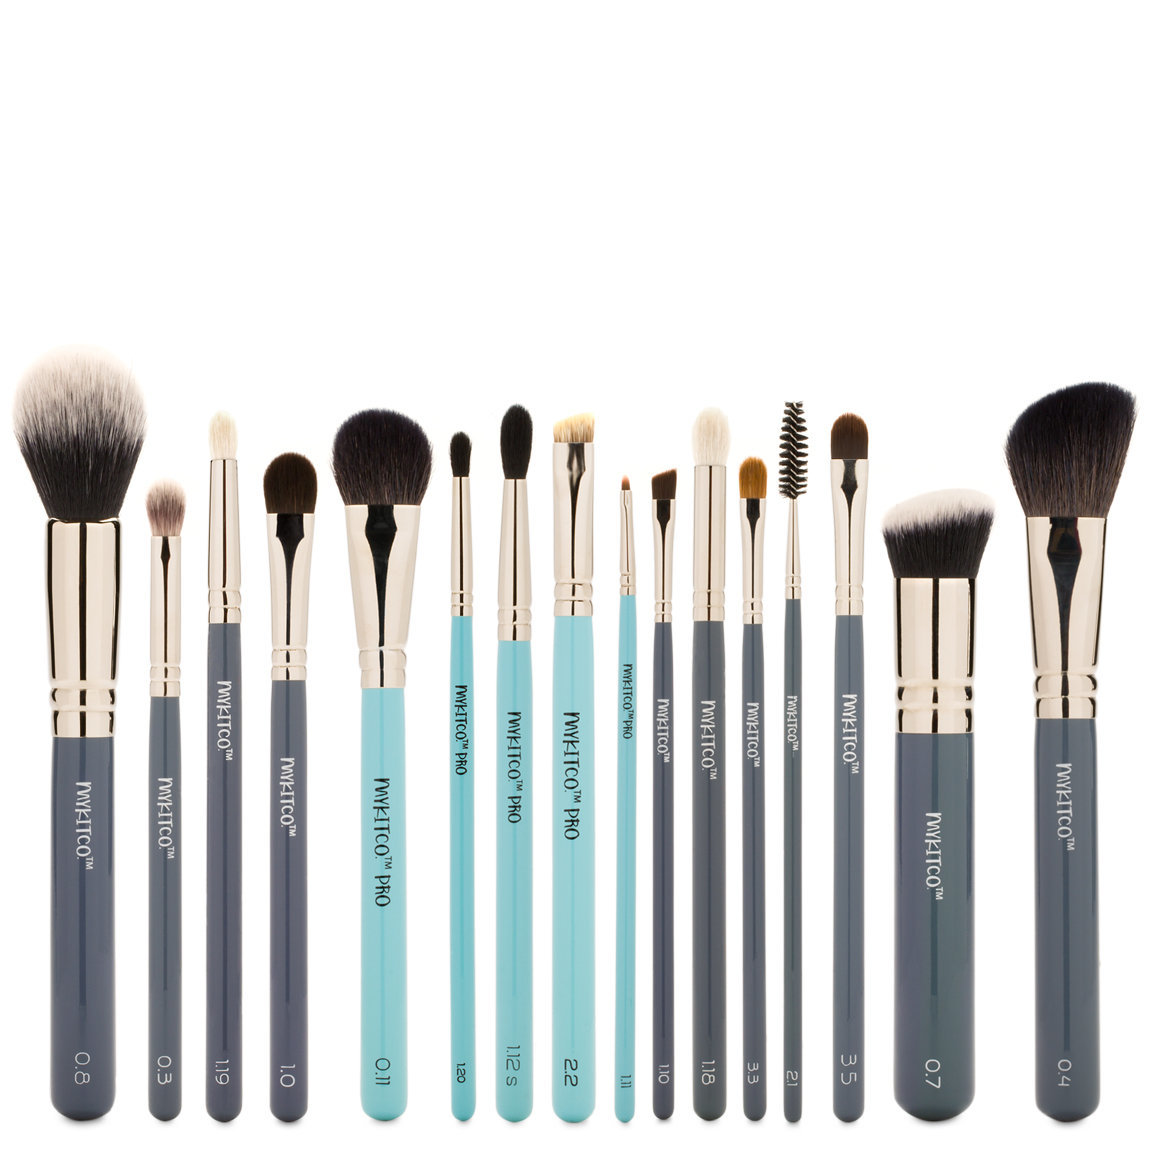 MYKITCO. My Pro Selects Makeup Brush Set product swatch.